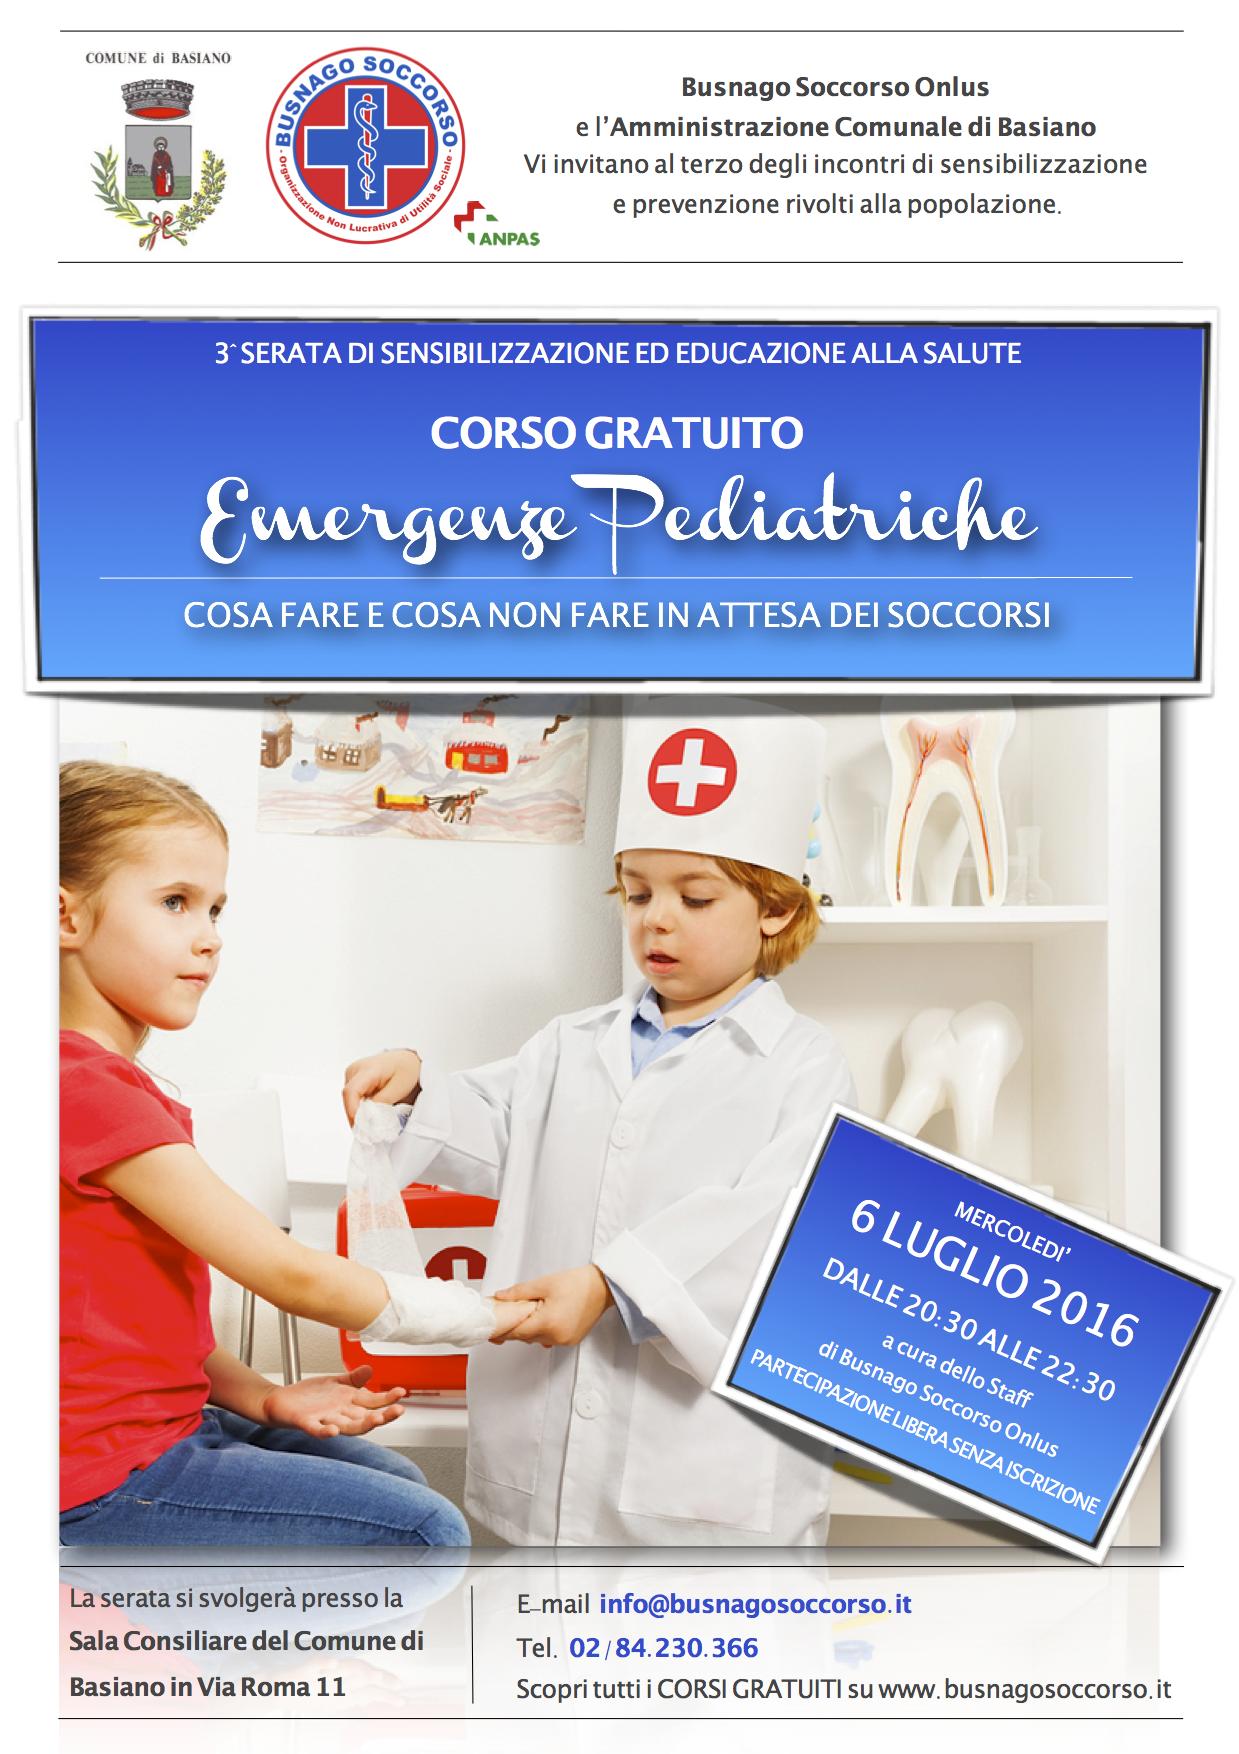 emergenze_pediatriche_2016_busnagosoccorso